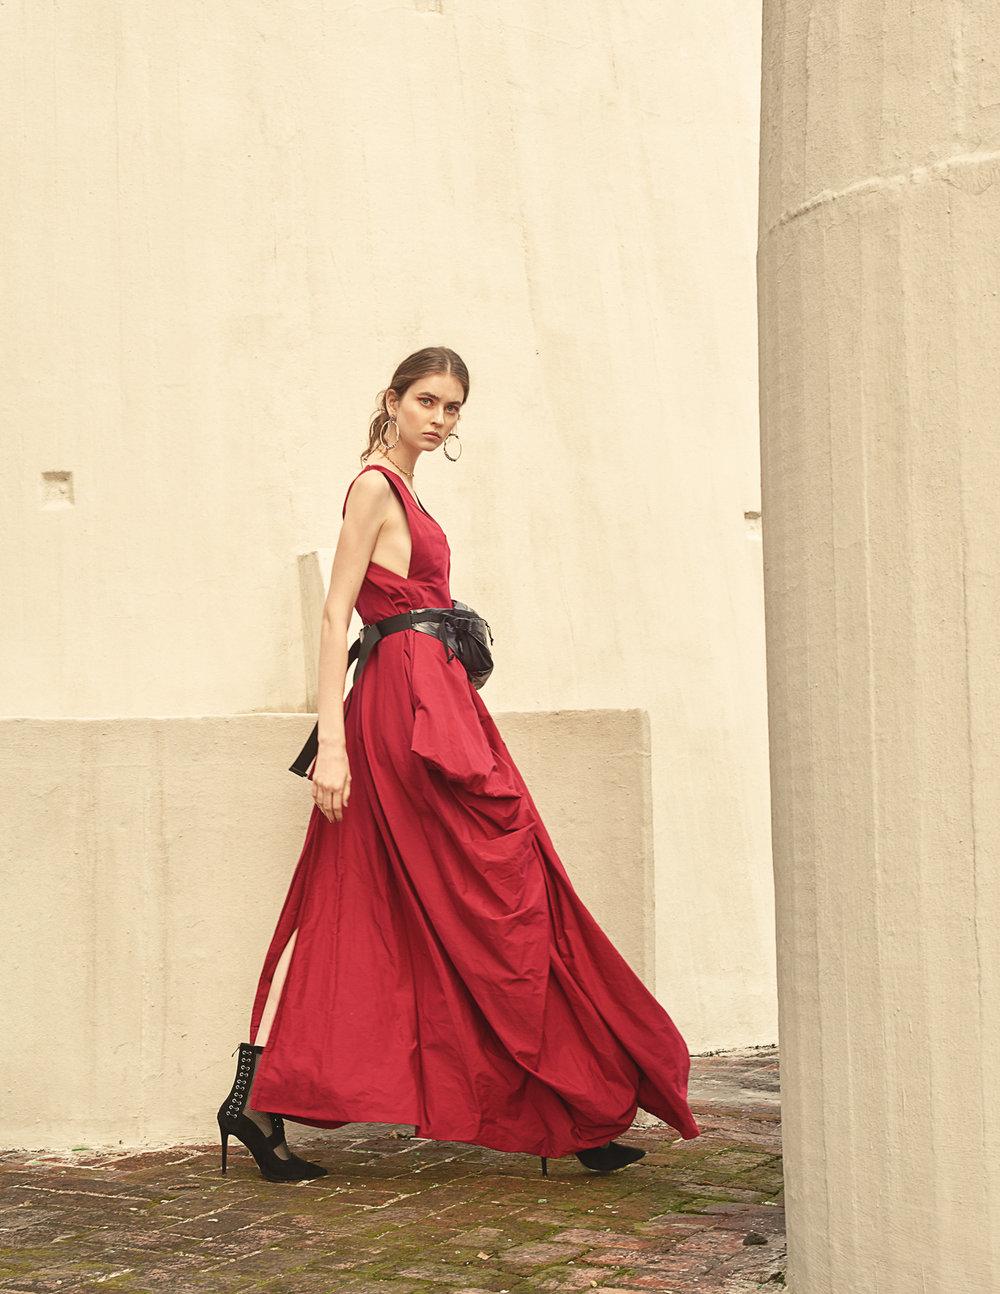 Earrings  Dulce Claro   Necklace  Dulce Claro   Dress  Malafacha   Waist Bag  Supreme   Shoes  Rebeca Miranda